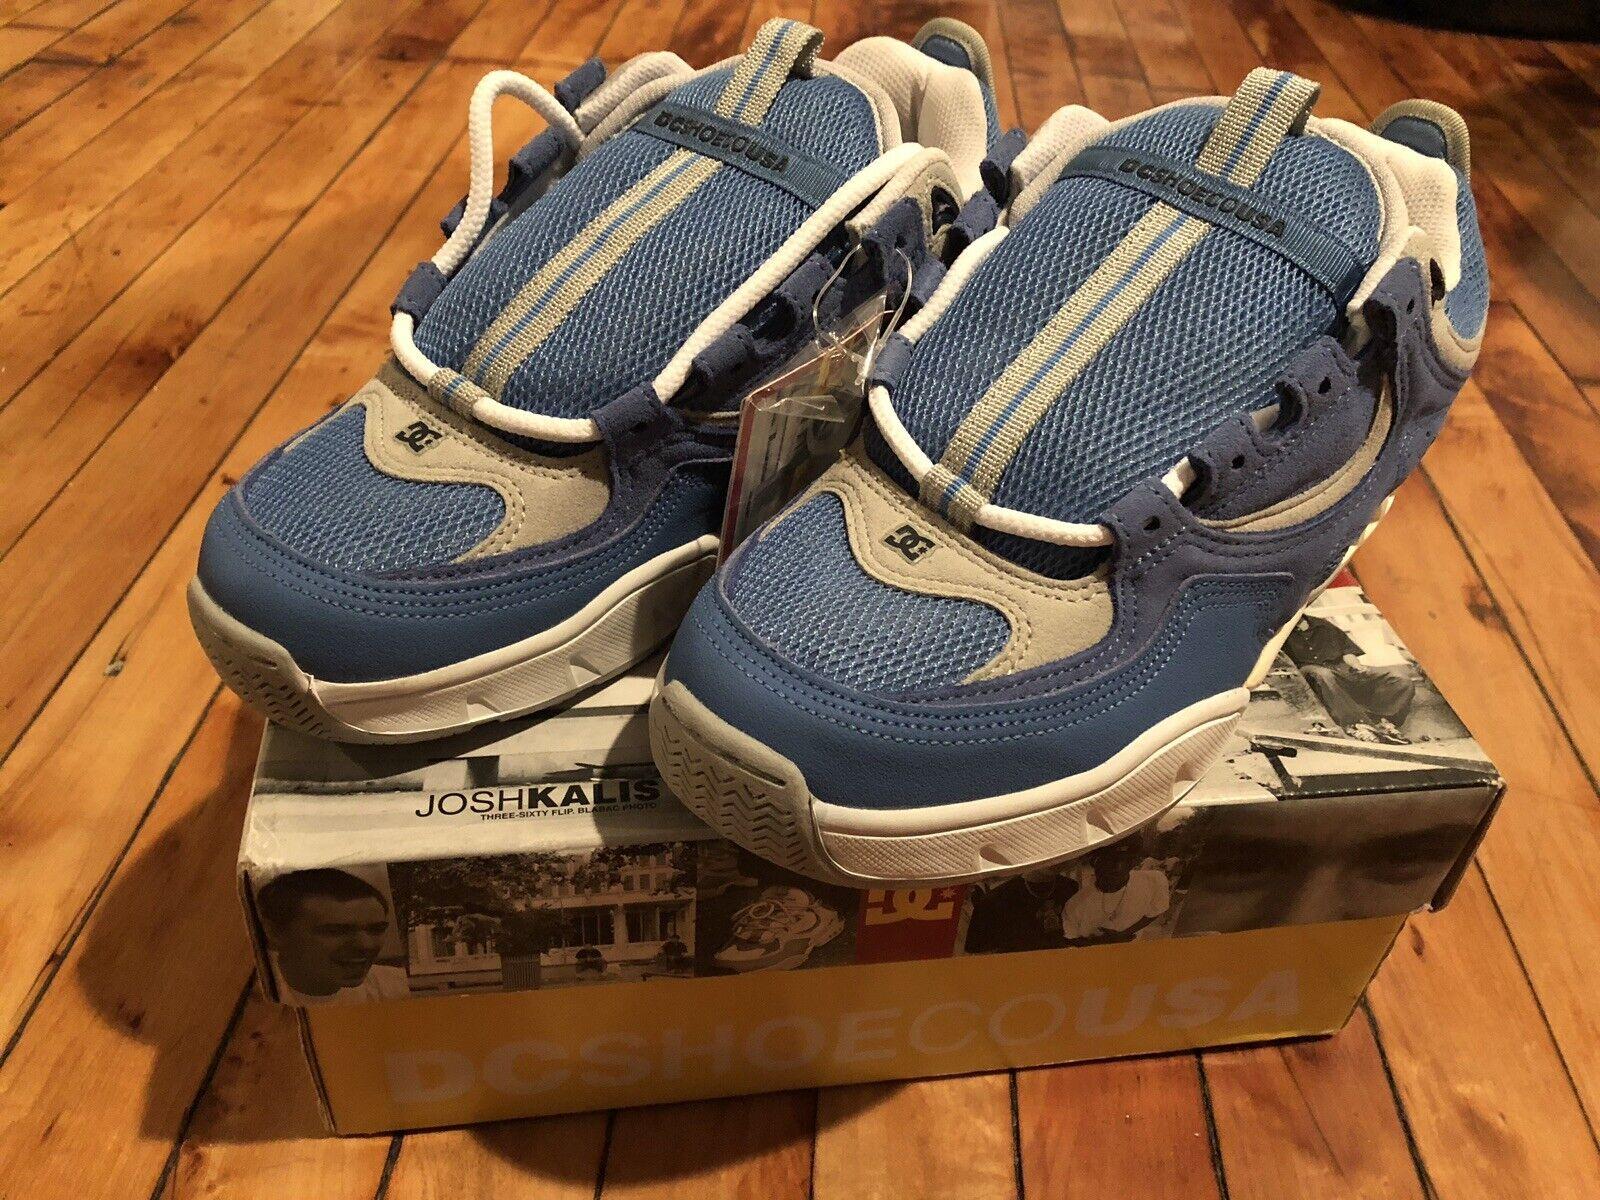 NEW IN BOX 2000 DC SHOES KALIS OG - LIGHT blueE -SIZE 9